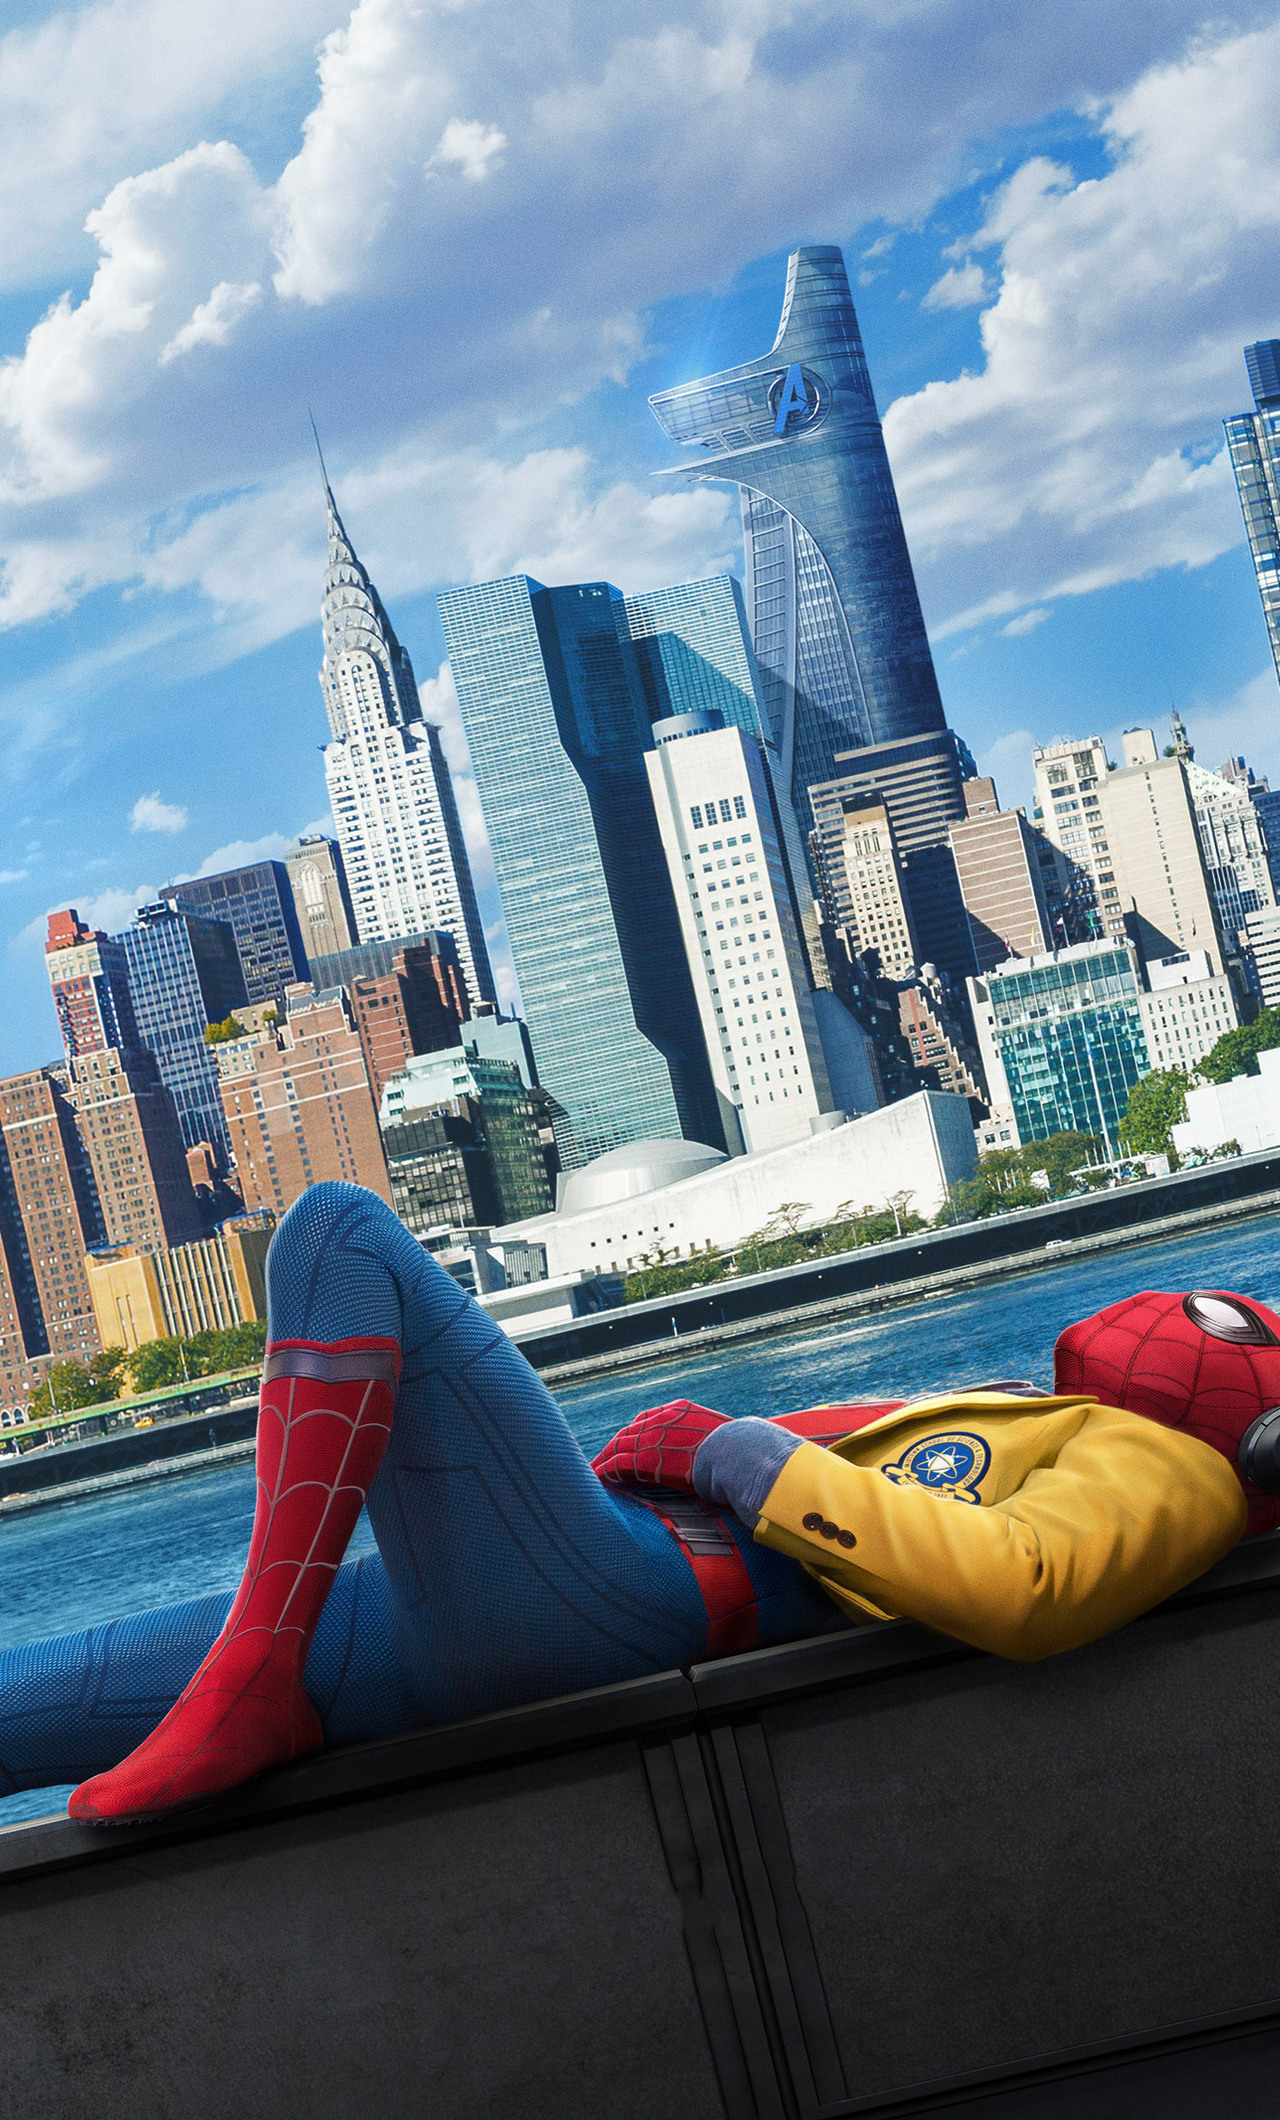 spiderman-homecoming-2017-ad.jpg